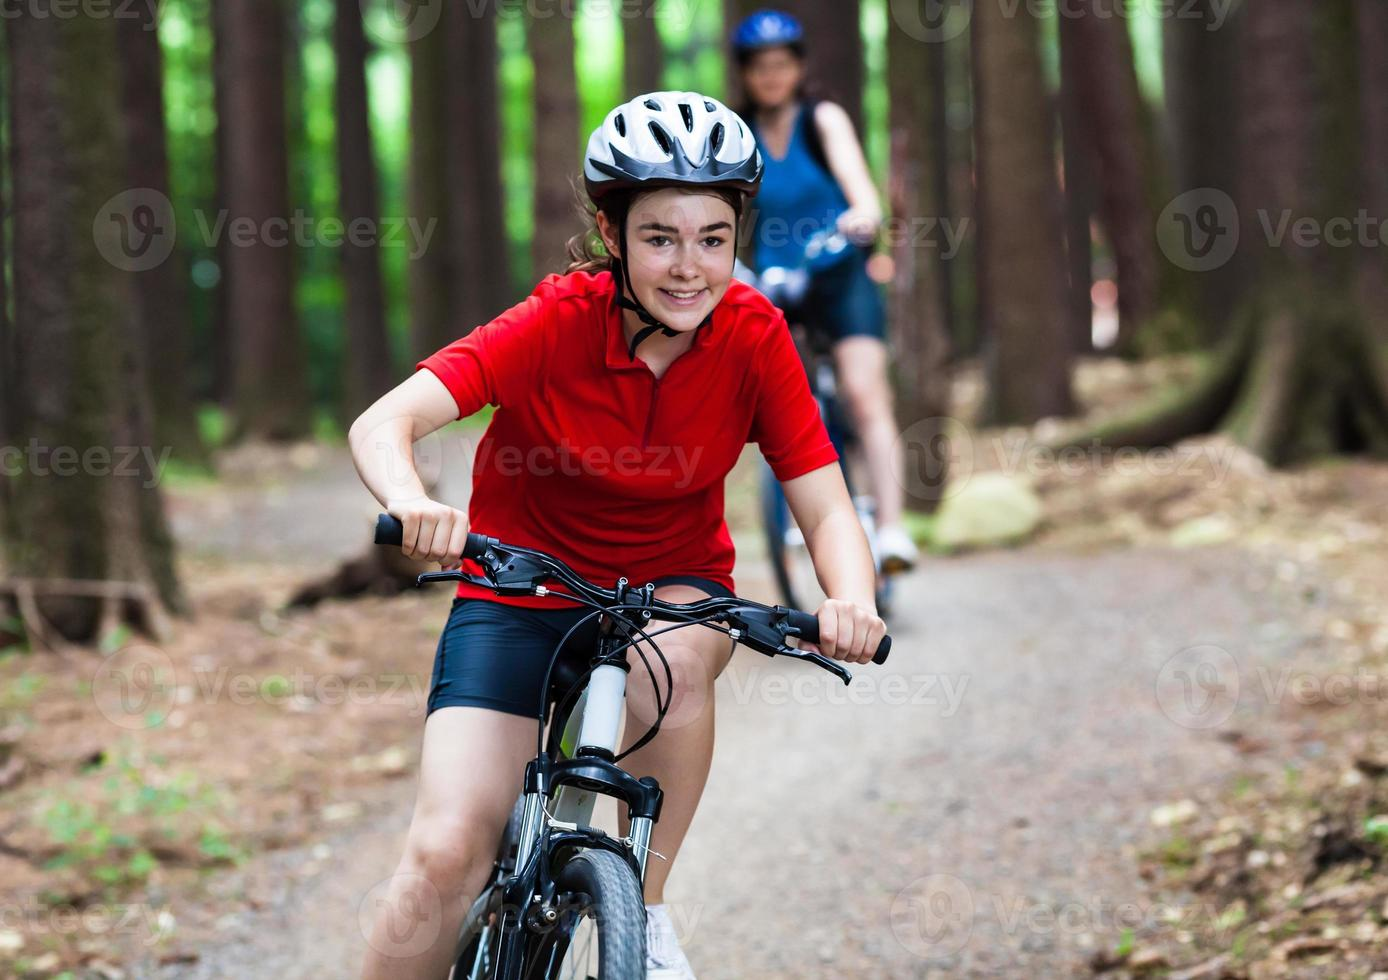 due donne in bicicletta foto